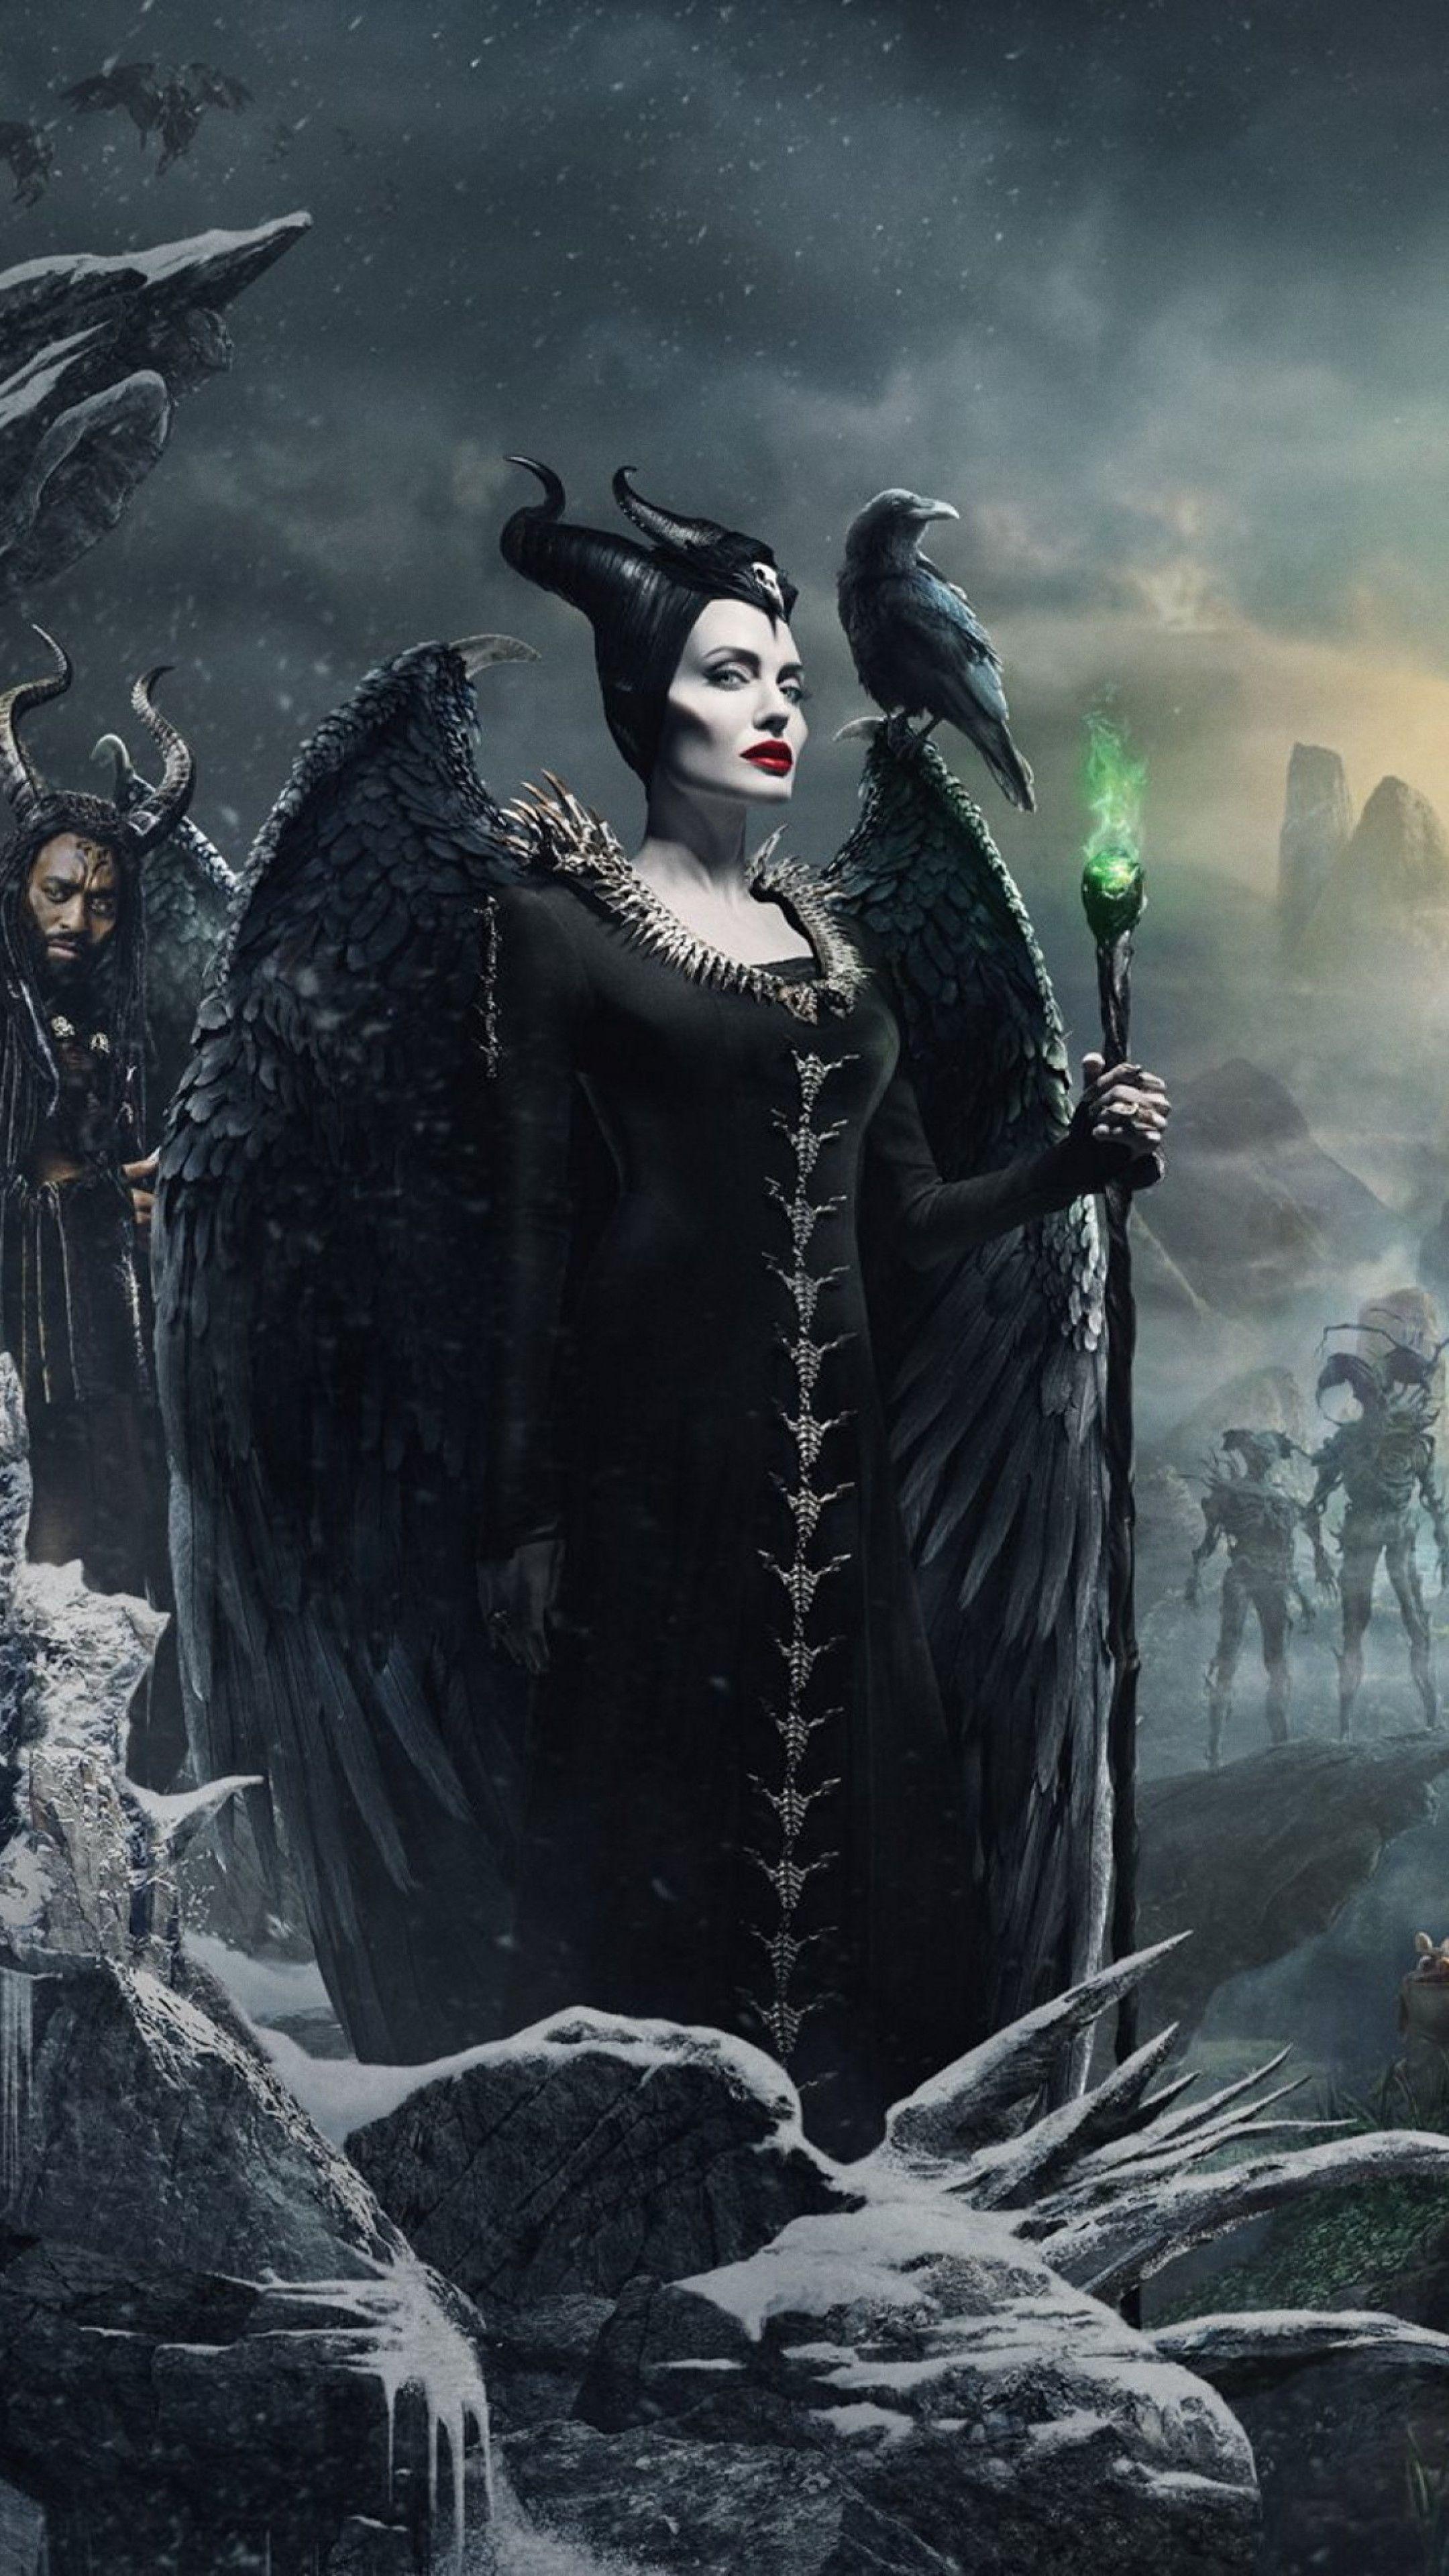 Maleficent Mistress Of Evil 4k New In 2160x3840 Resolution Maleficent Art Disney Maleficent Maleficent Quotes